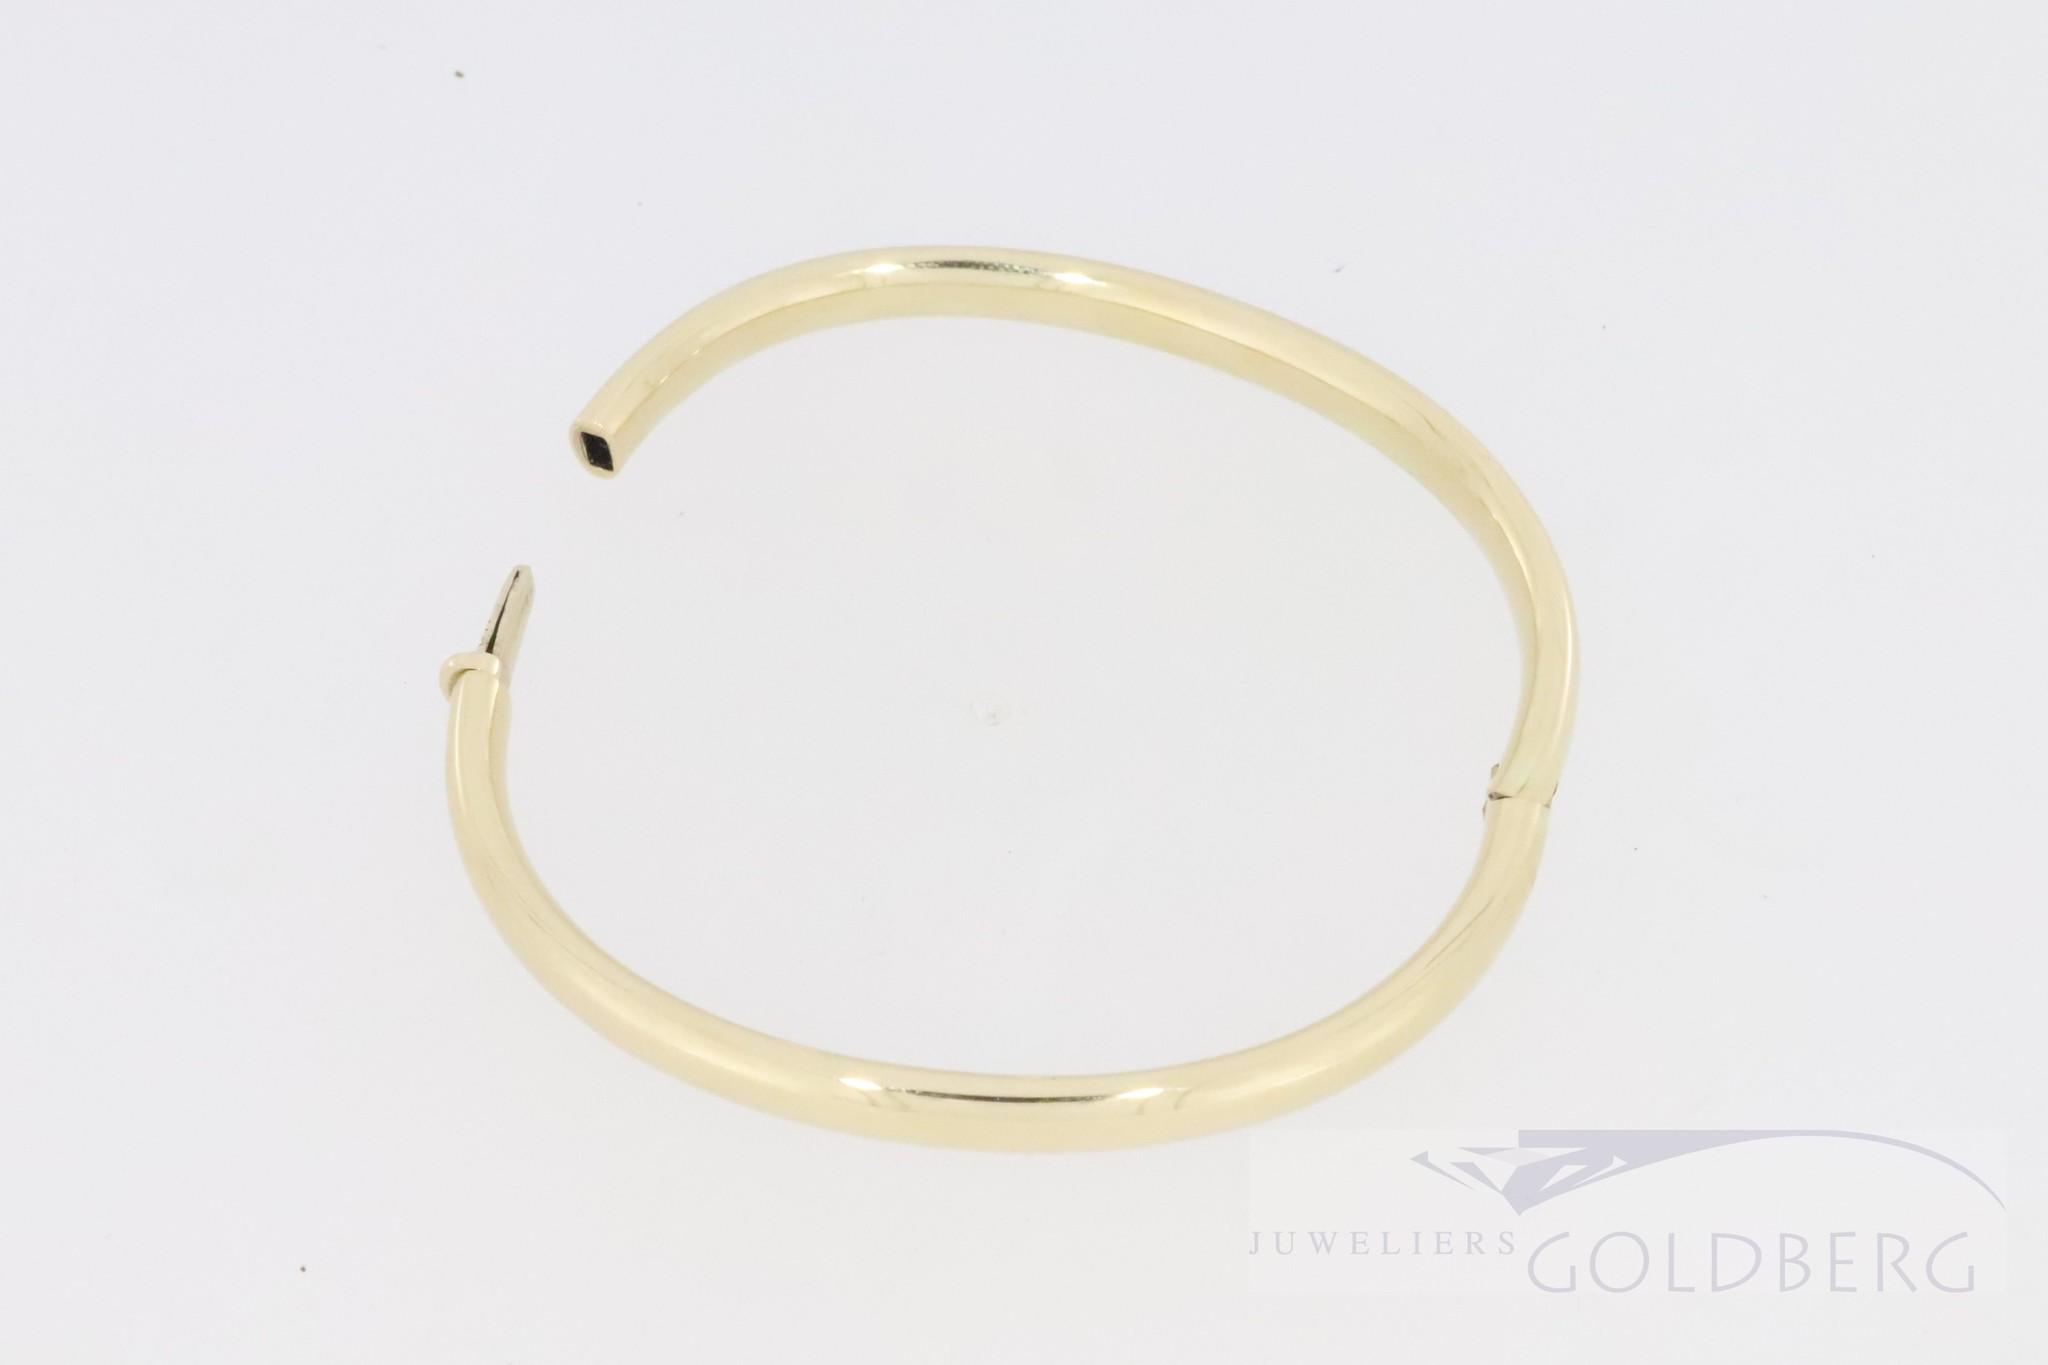 stylish 14k yellow gold slave bangle